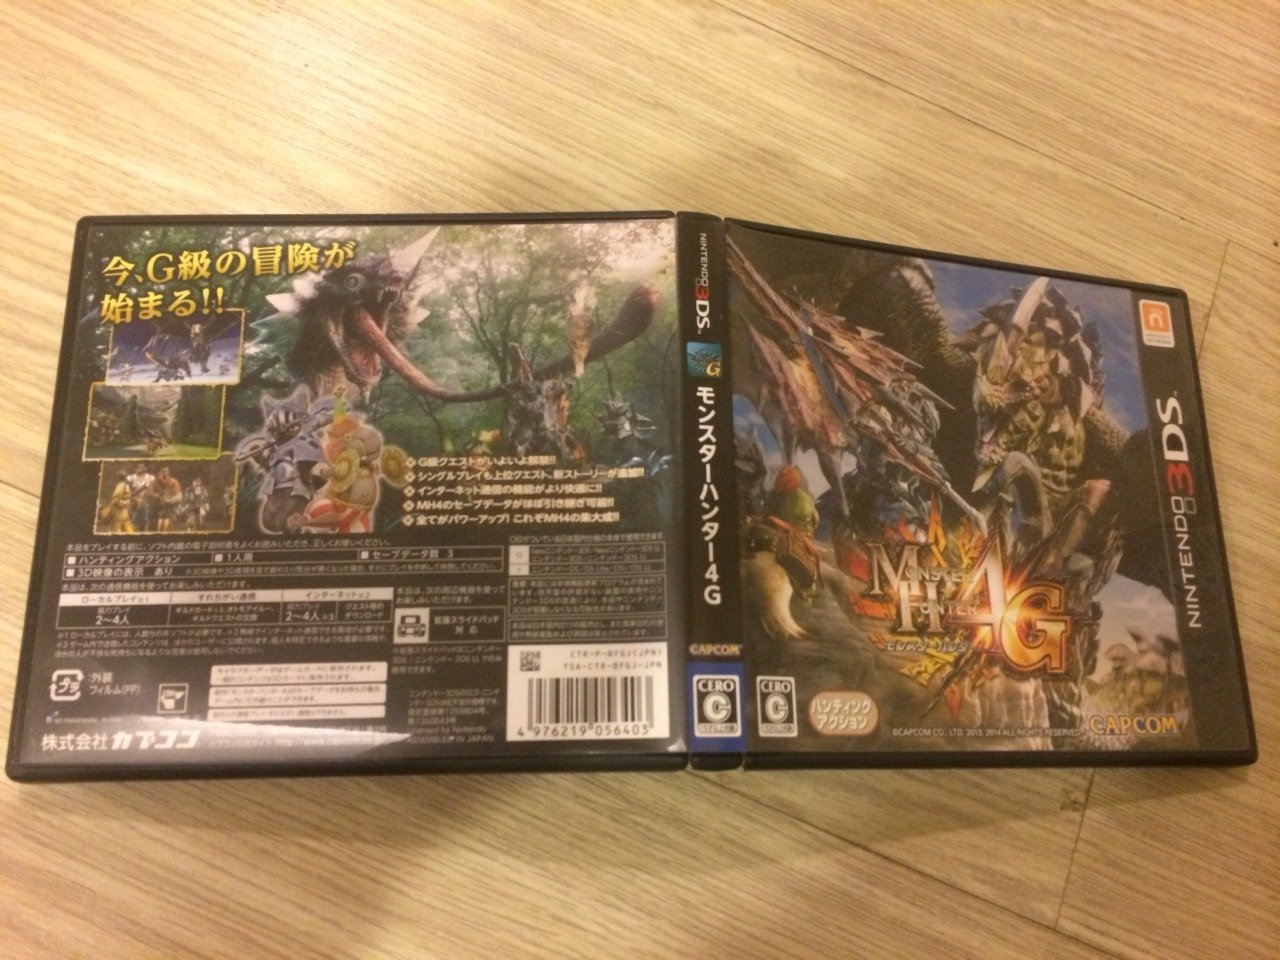 3DS N3DS 魔物獵人 4G 純日版 MONSTER HUNTER 4G 日機用 MH4G